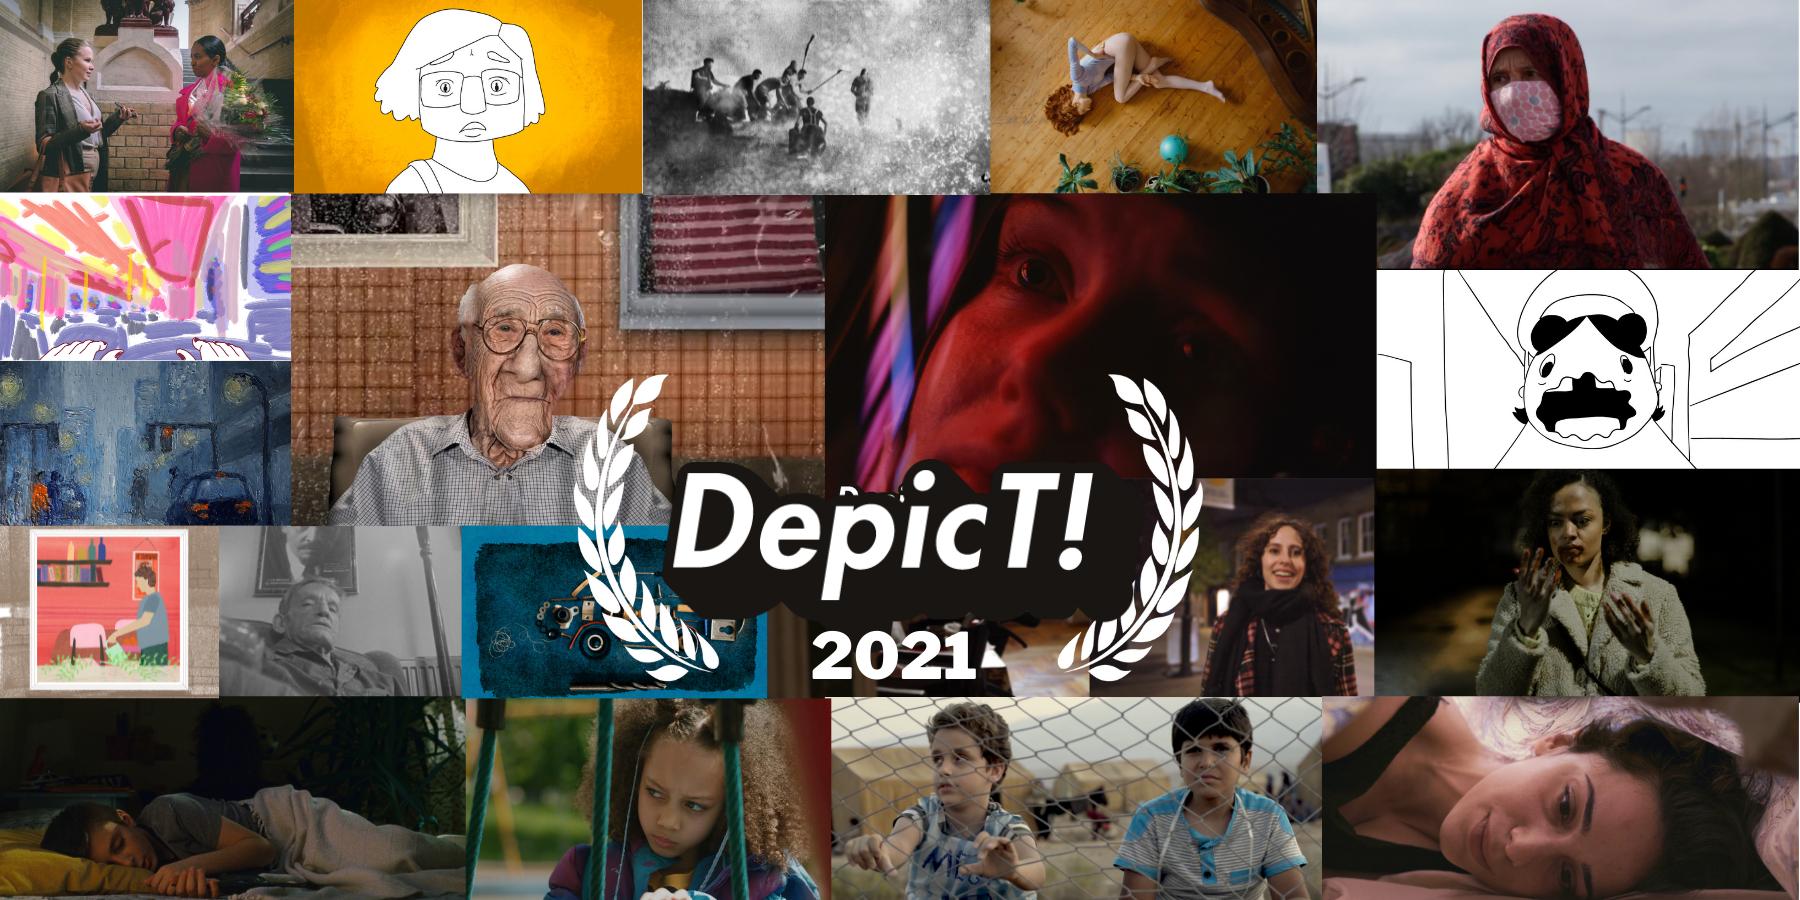 Depict 2021 shortlist montage